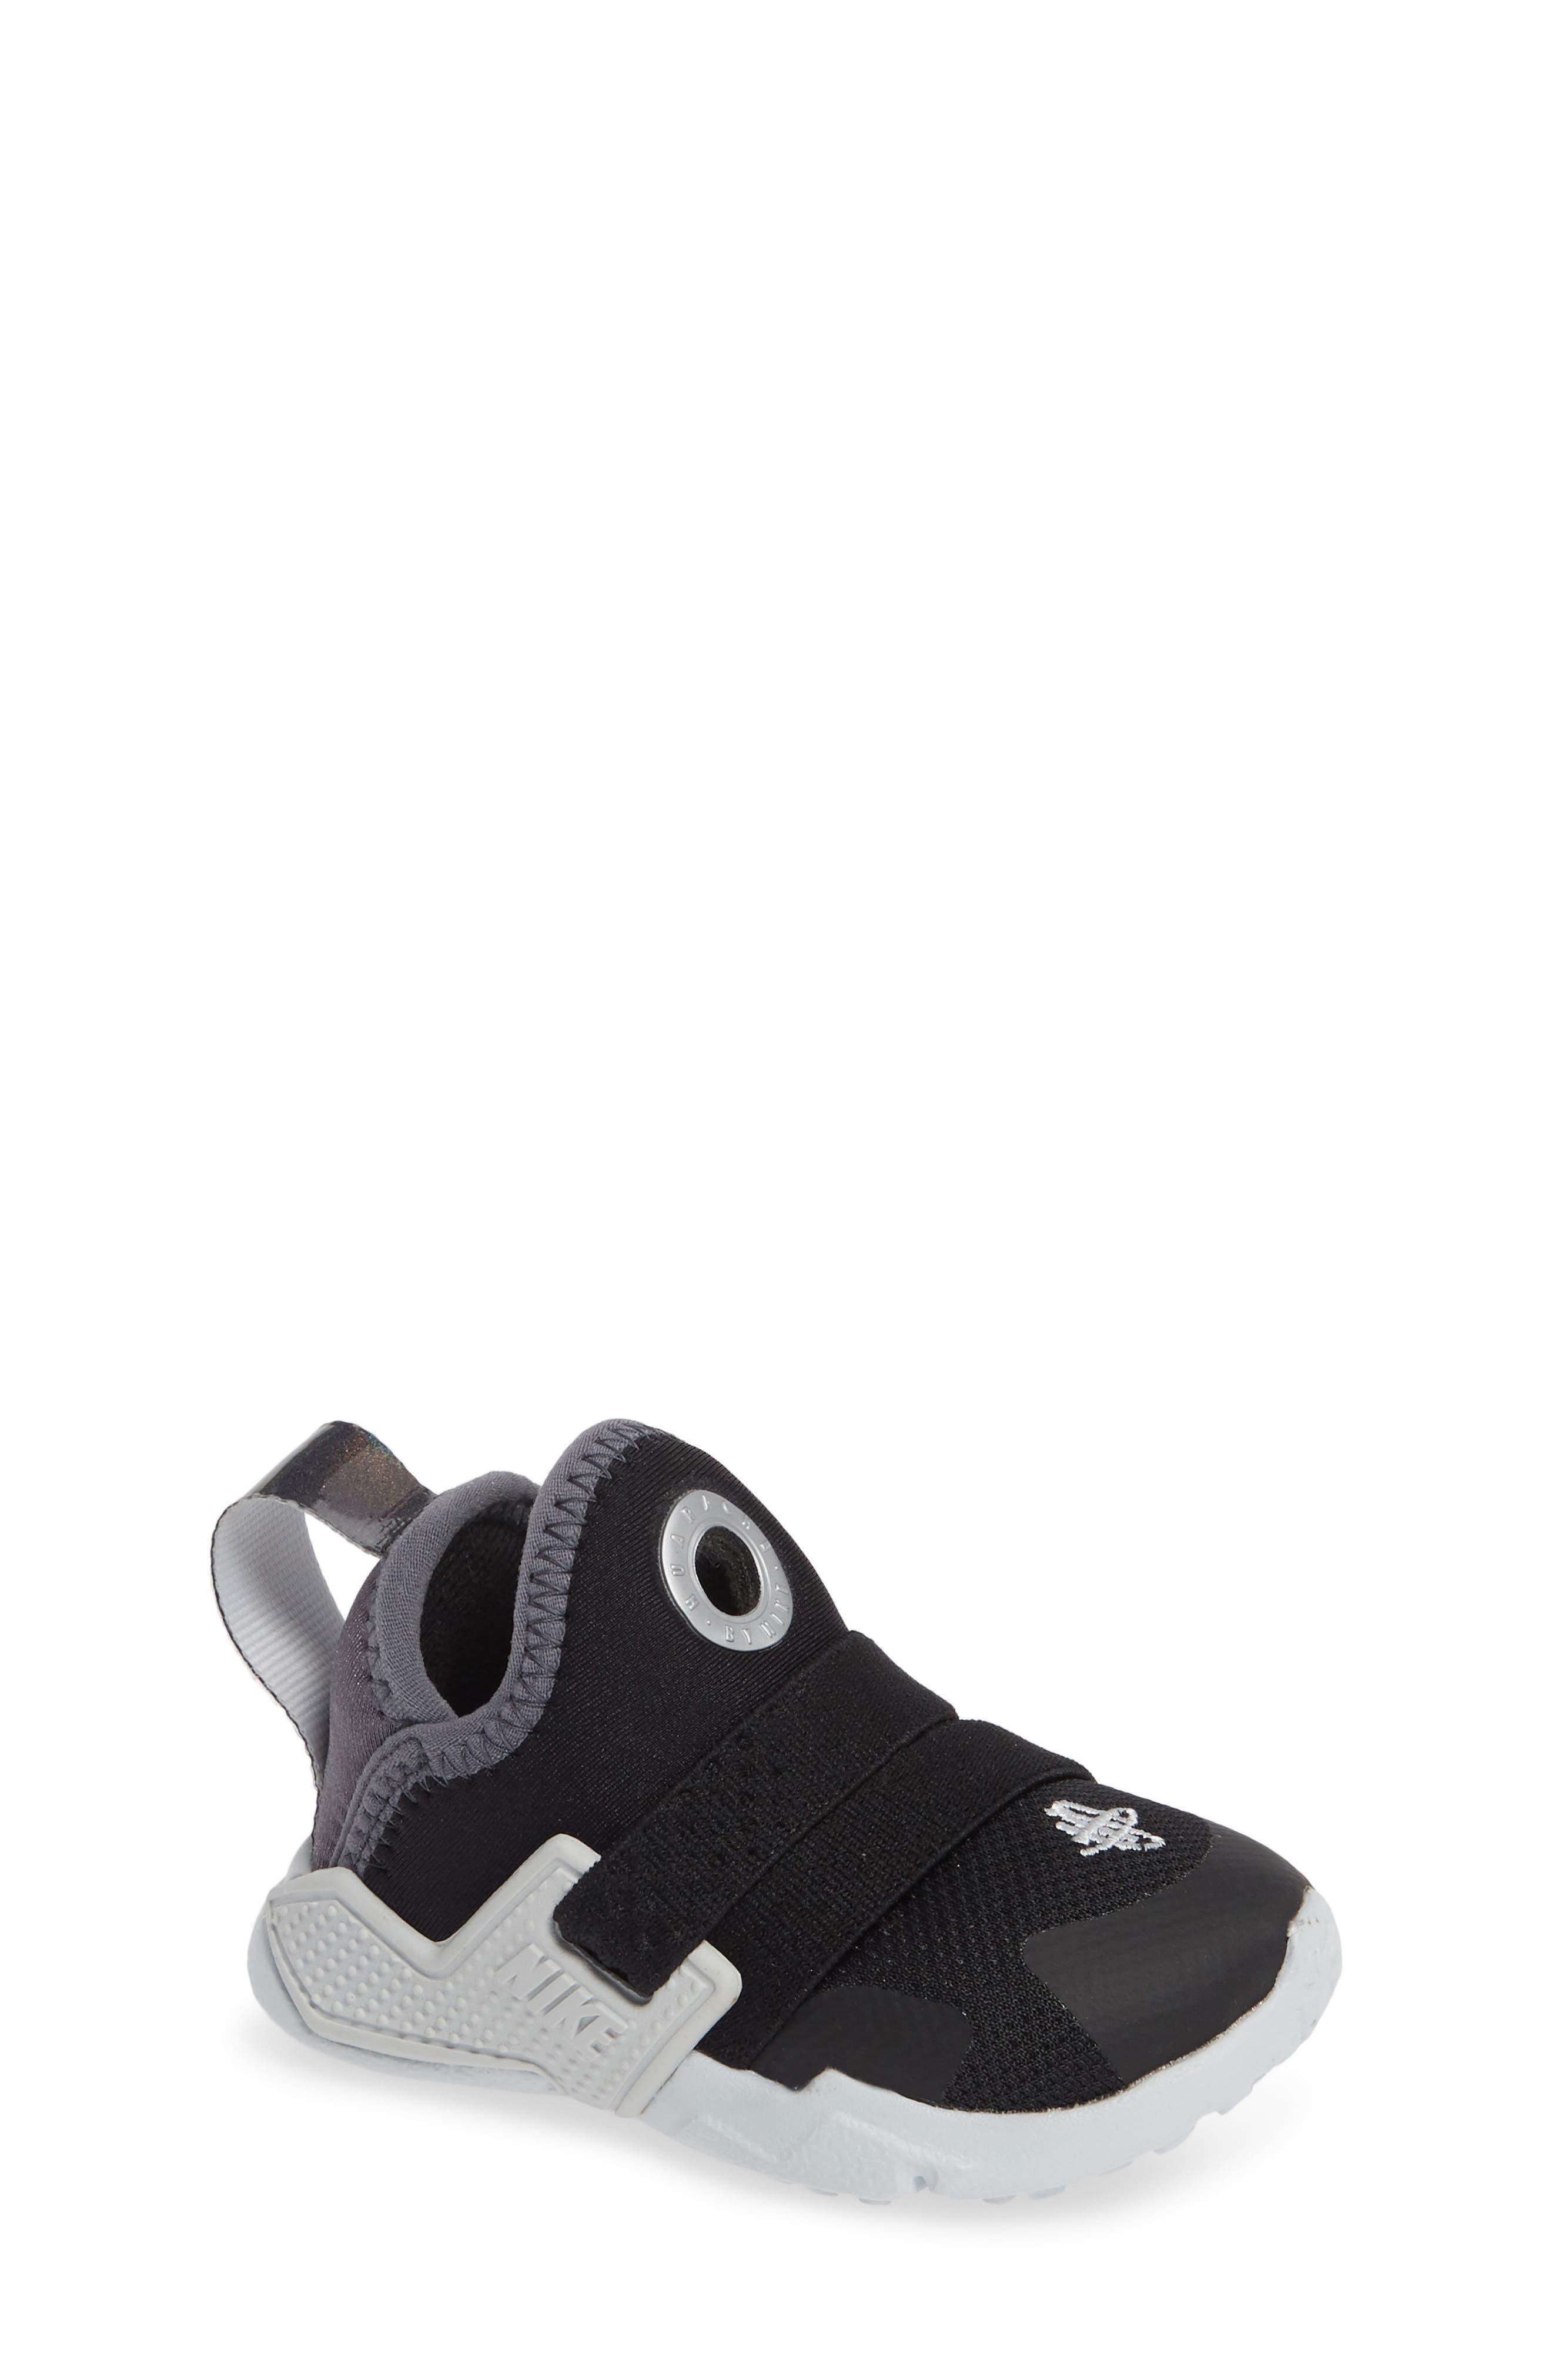 NIKE Huarache Extreme Sneaker, Main, color, BLACK/ METALLIC SILVER-GREY